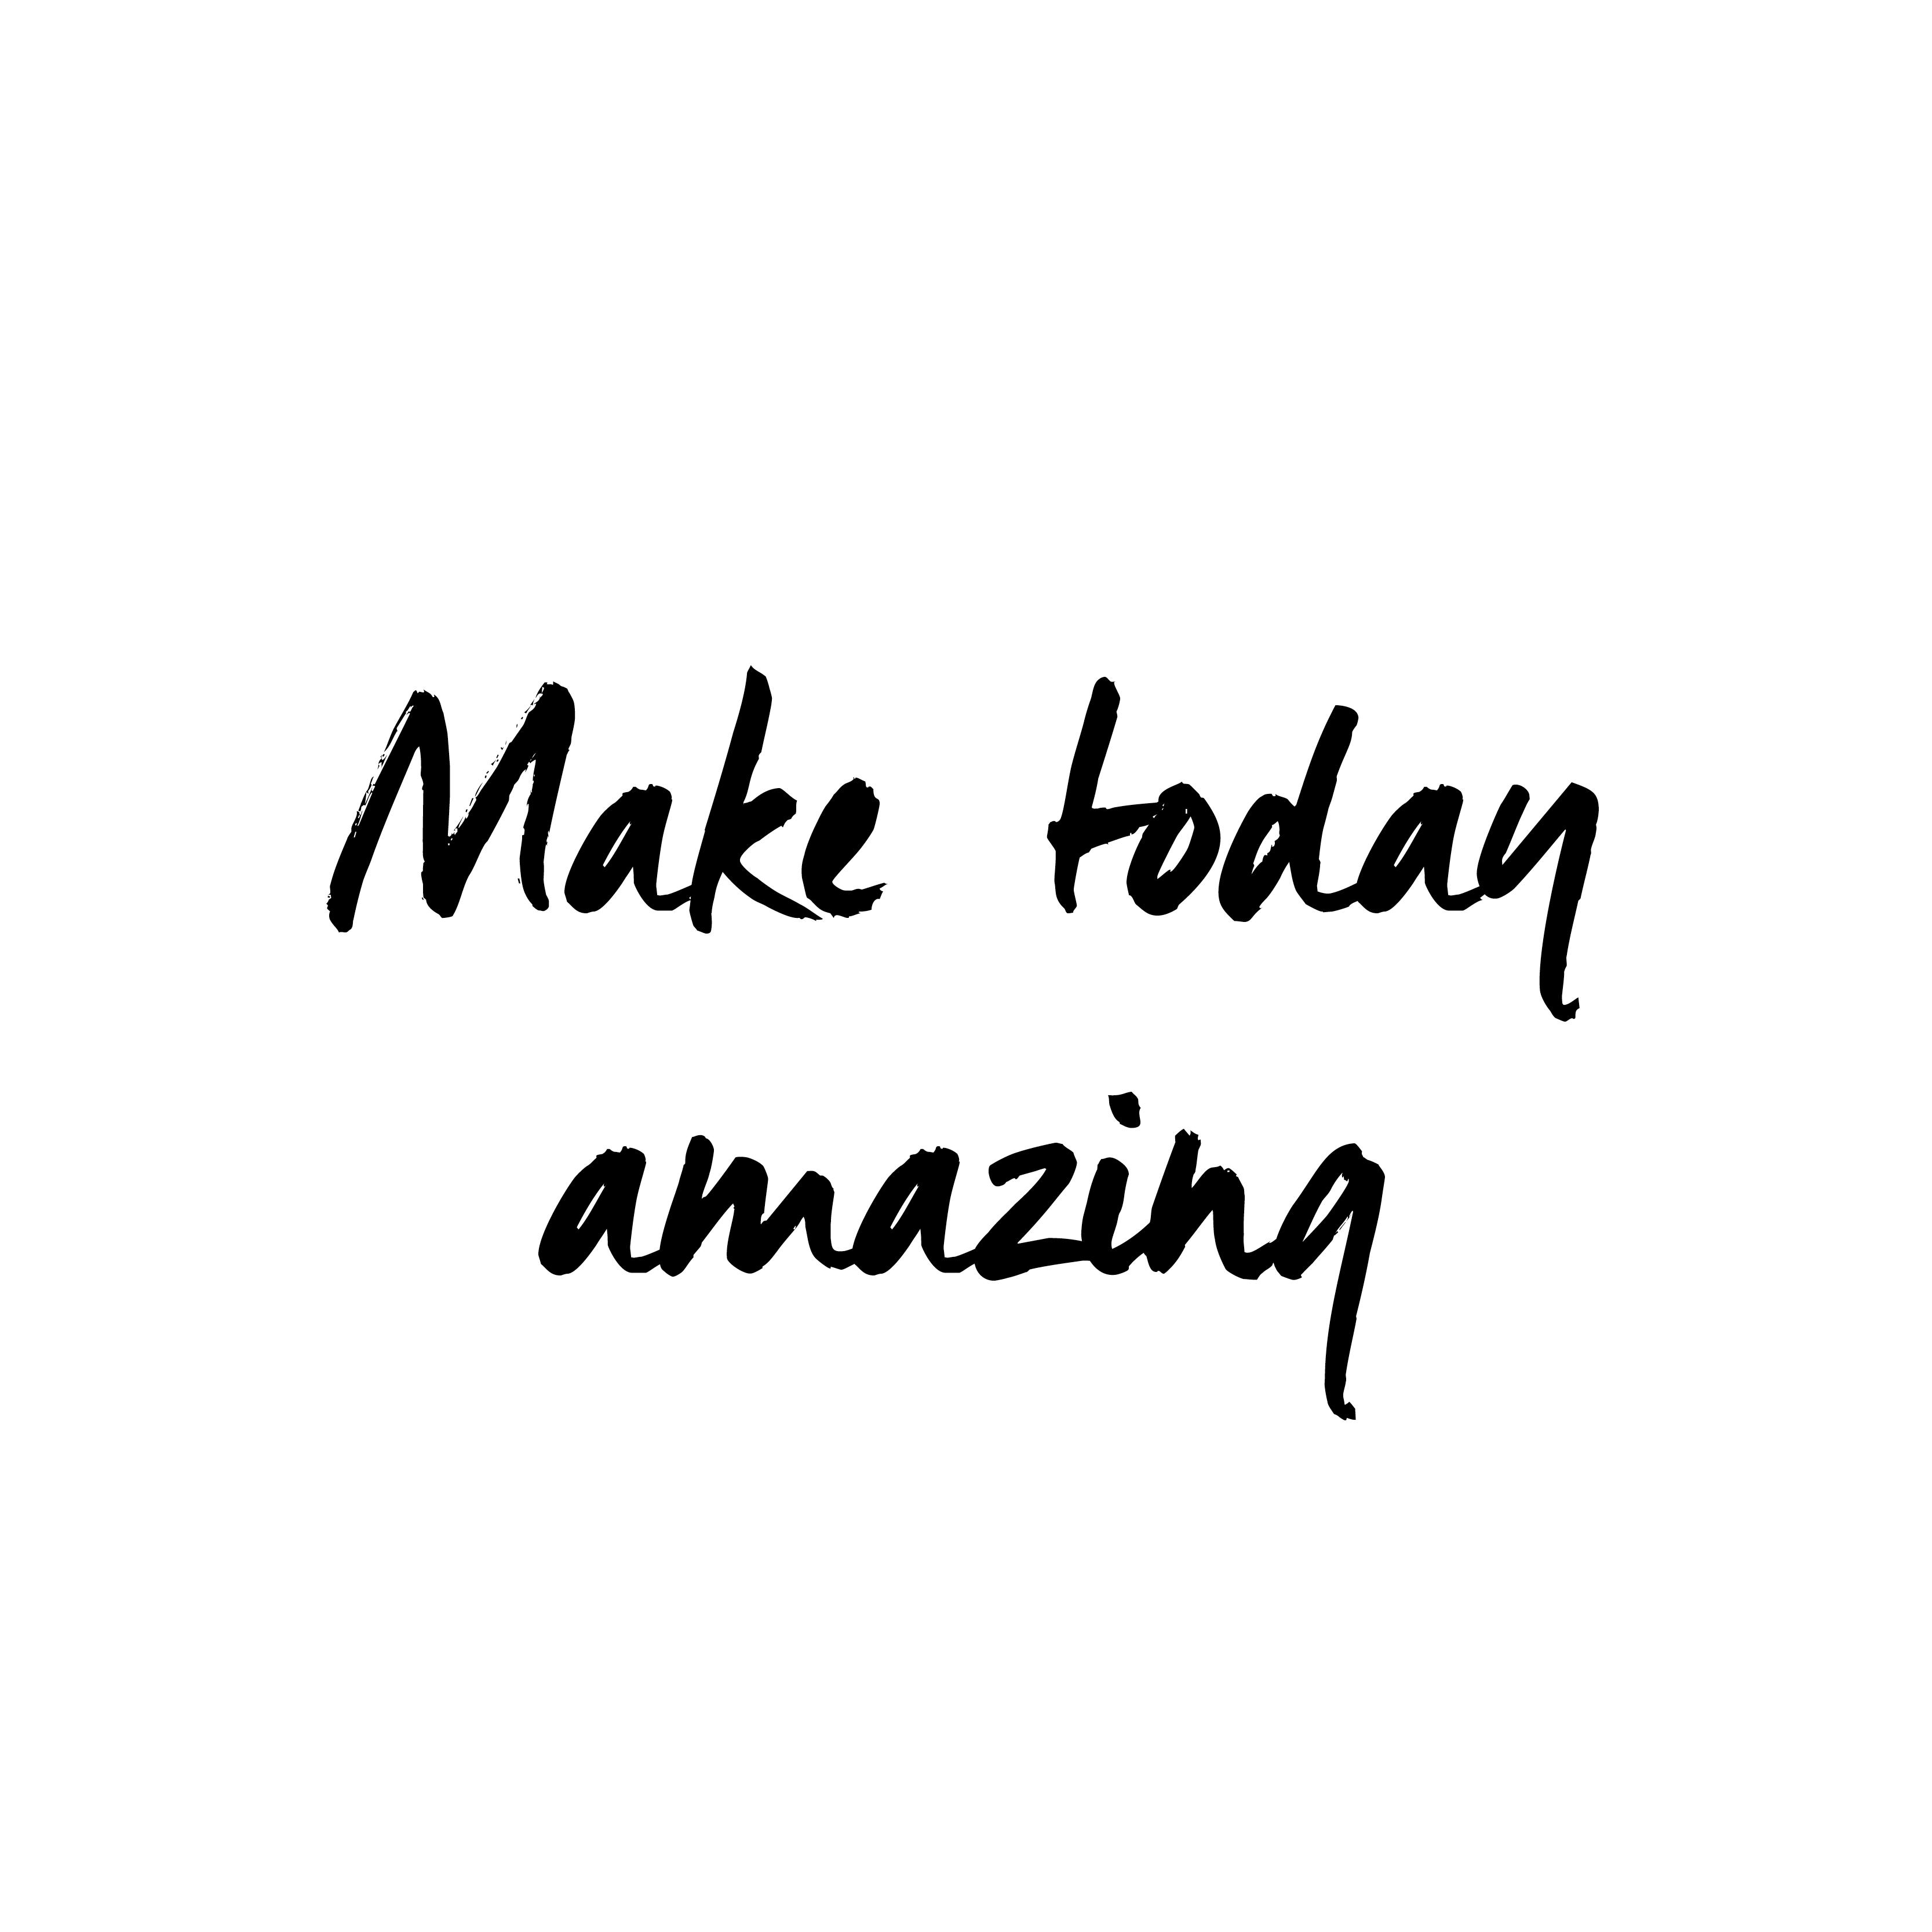 Make today amazing #quote  Senior quotes, Short inspirational